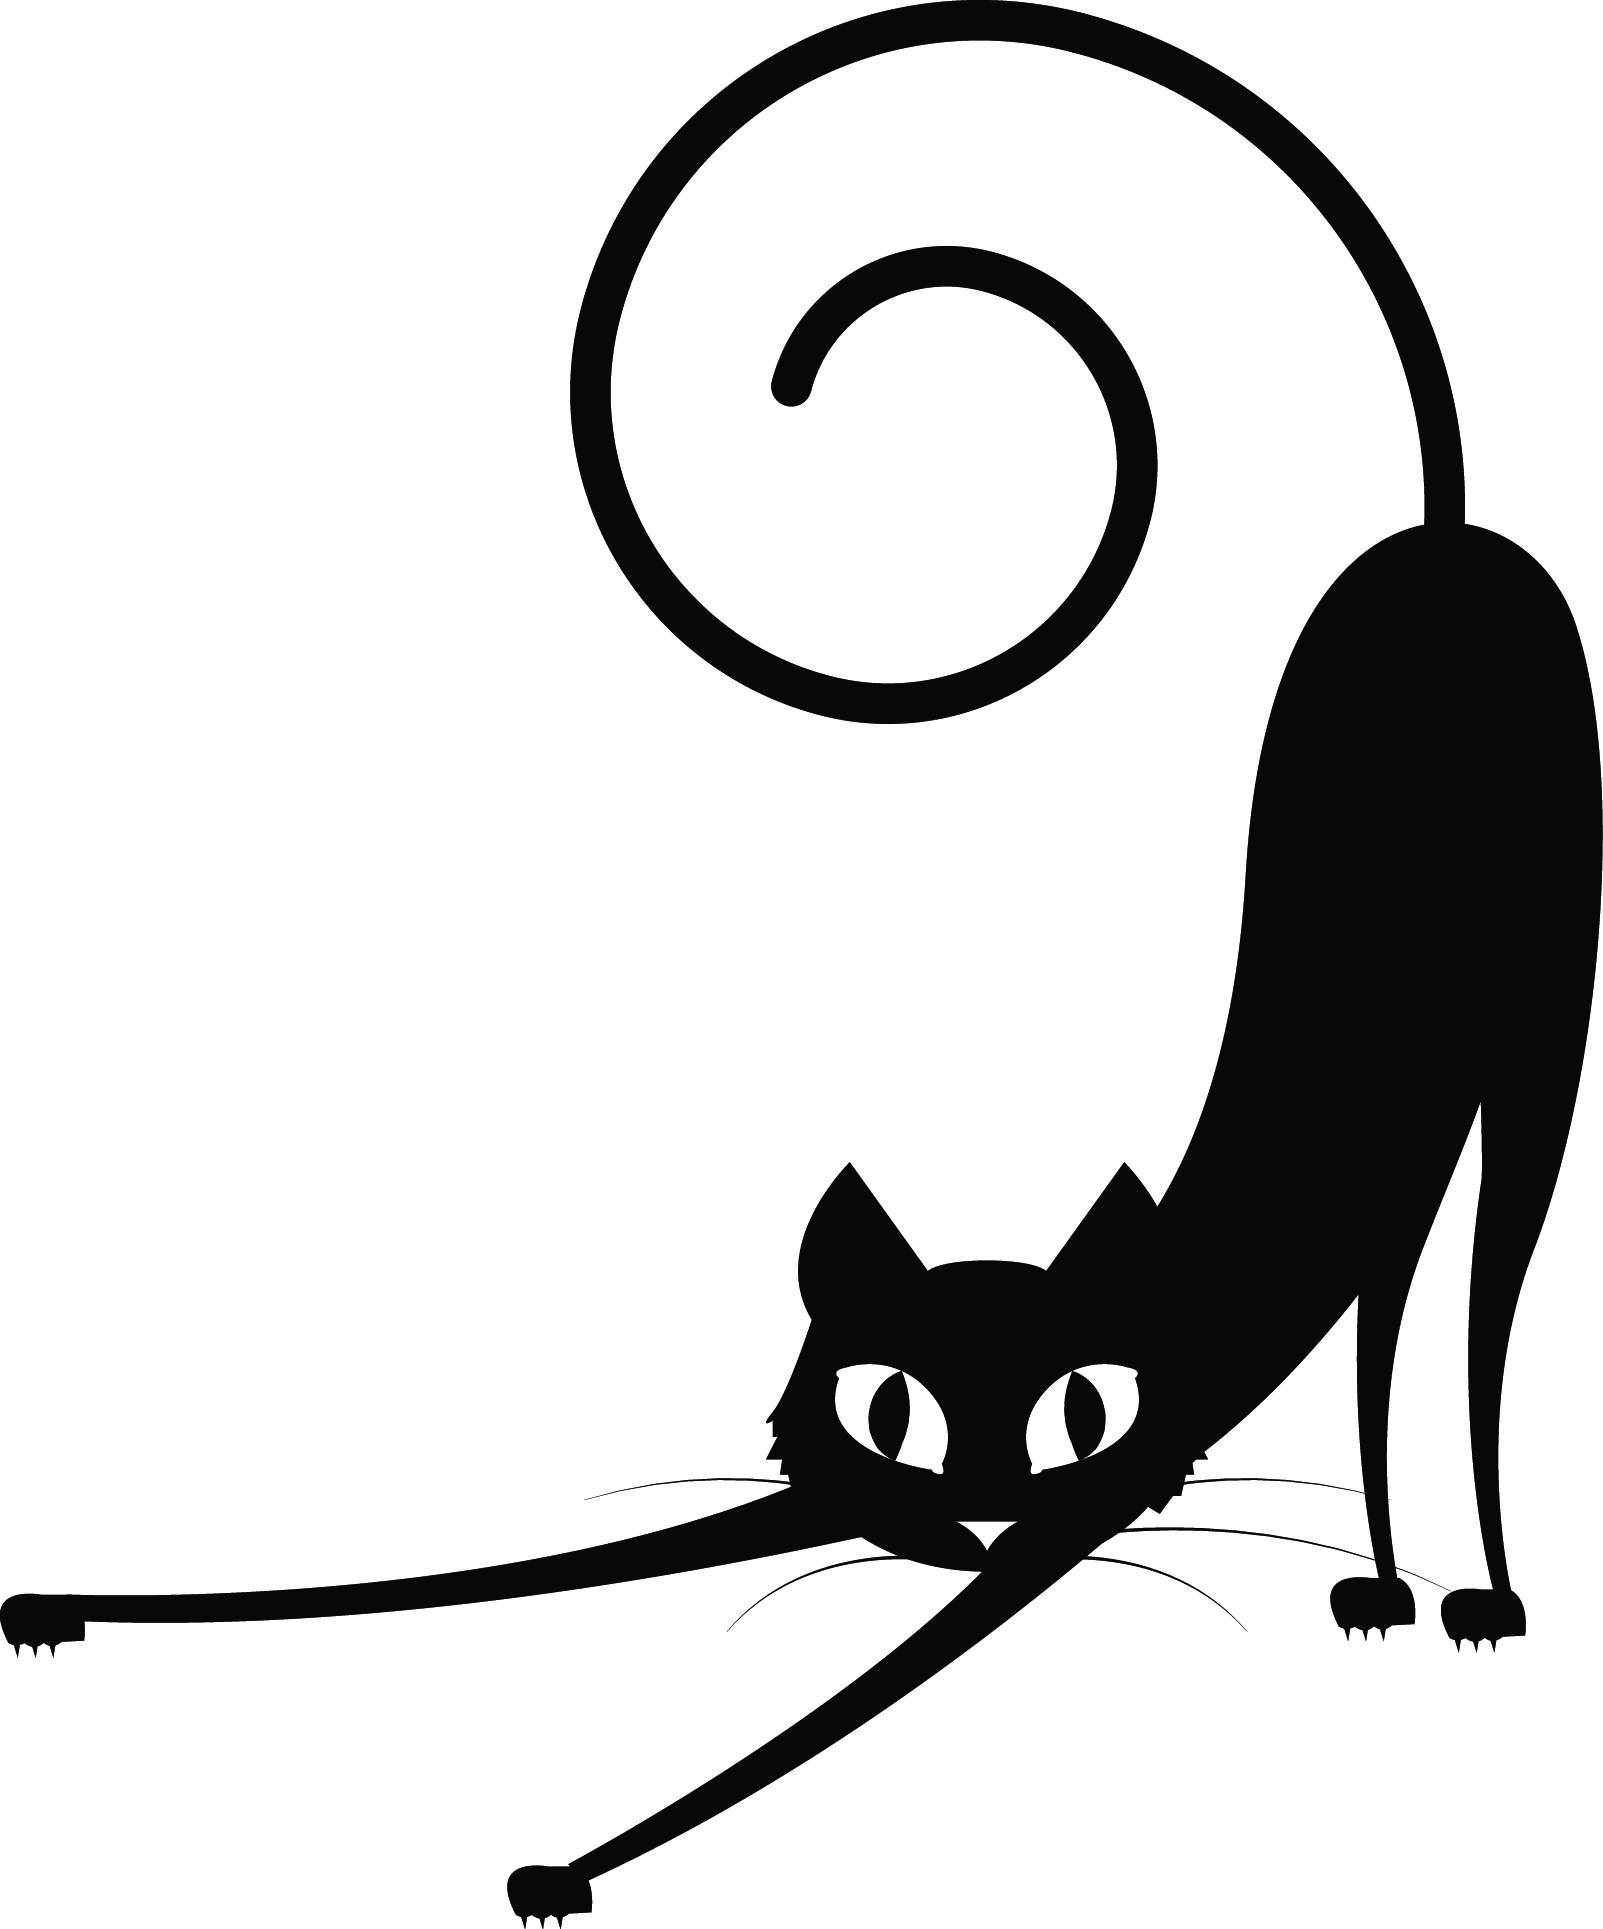 1603x1929 Black Cat Svg, Black Cat Halloween Svg. Cat Halloween Svg